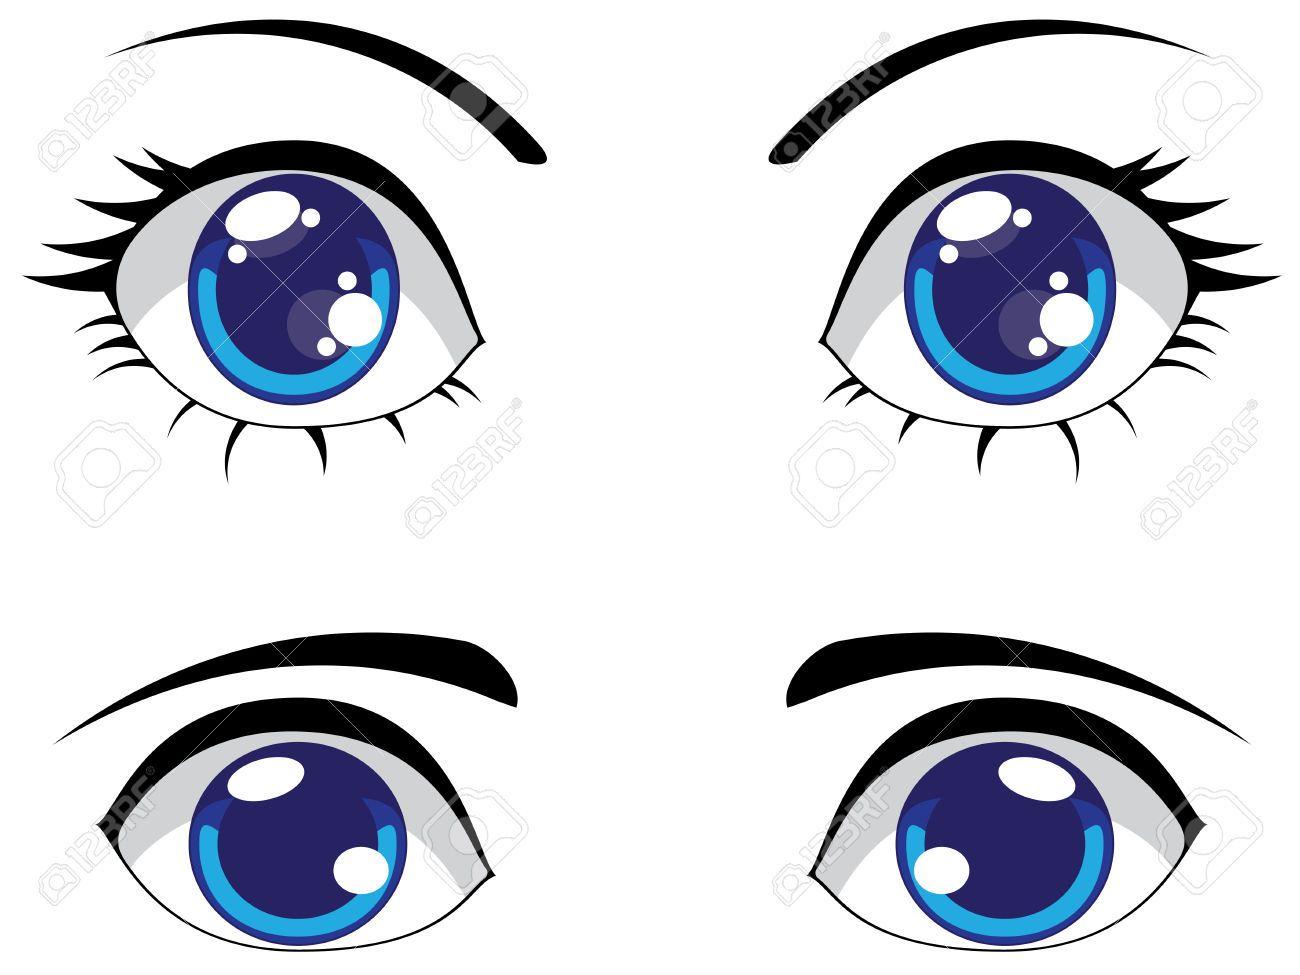 Related Image Cartoon Eyes Cartoon Drawings Eye Drawing